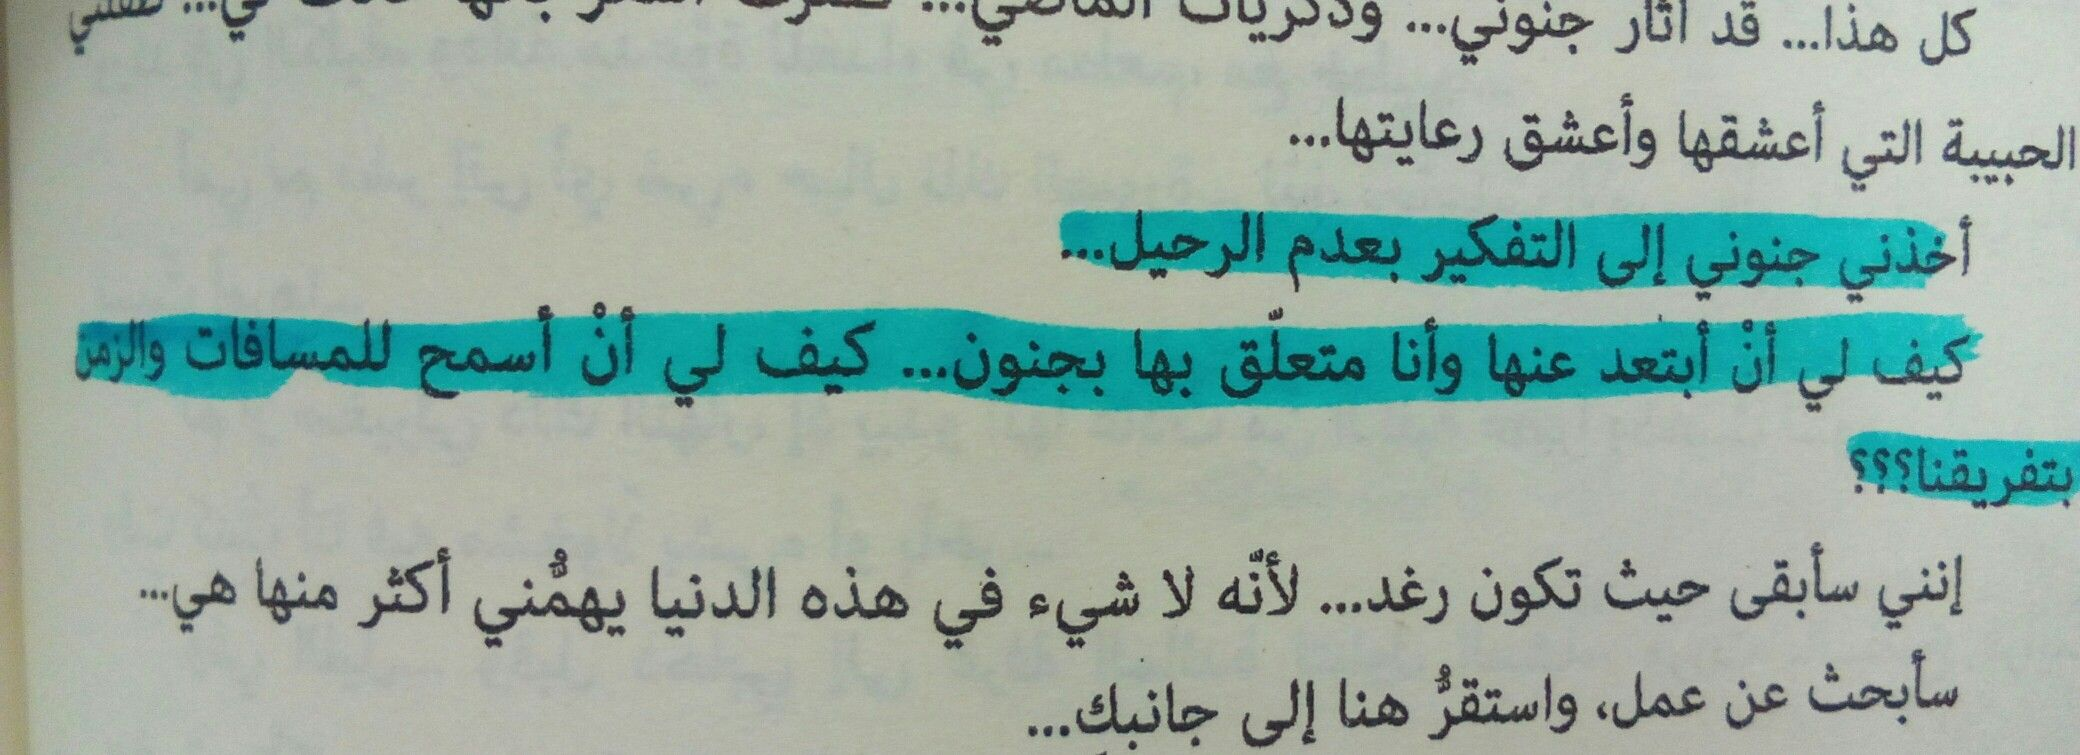 روايه انت لي Arabic Calligraphy Lol Calligraphy